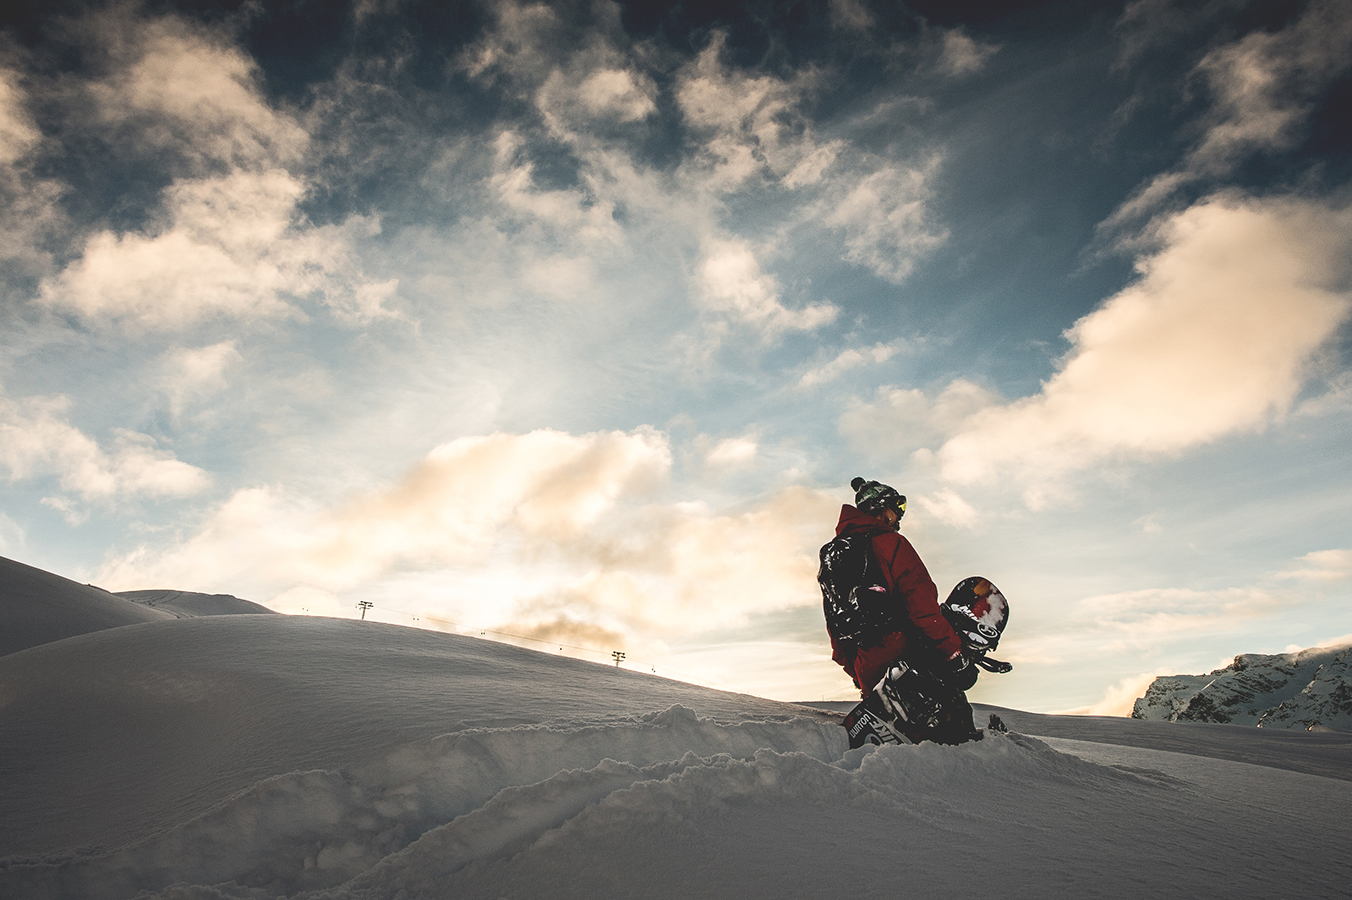 NicolasMüller_Hike_Sunset_Snowboard_StMoritz_SilvanoZeiter_2.jpg